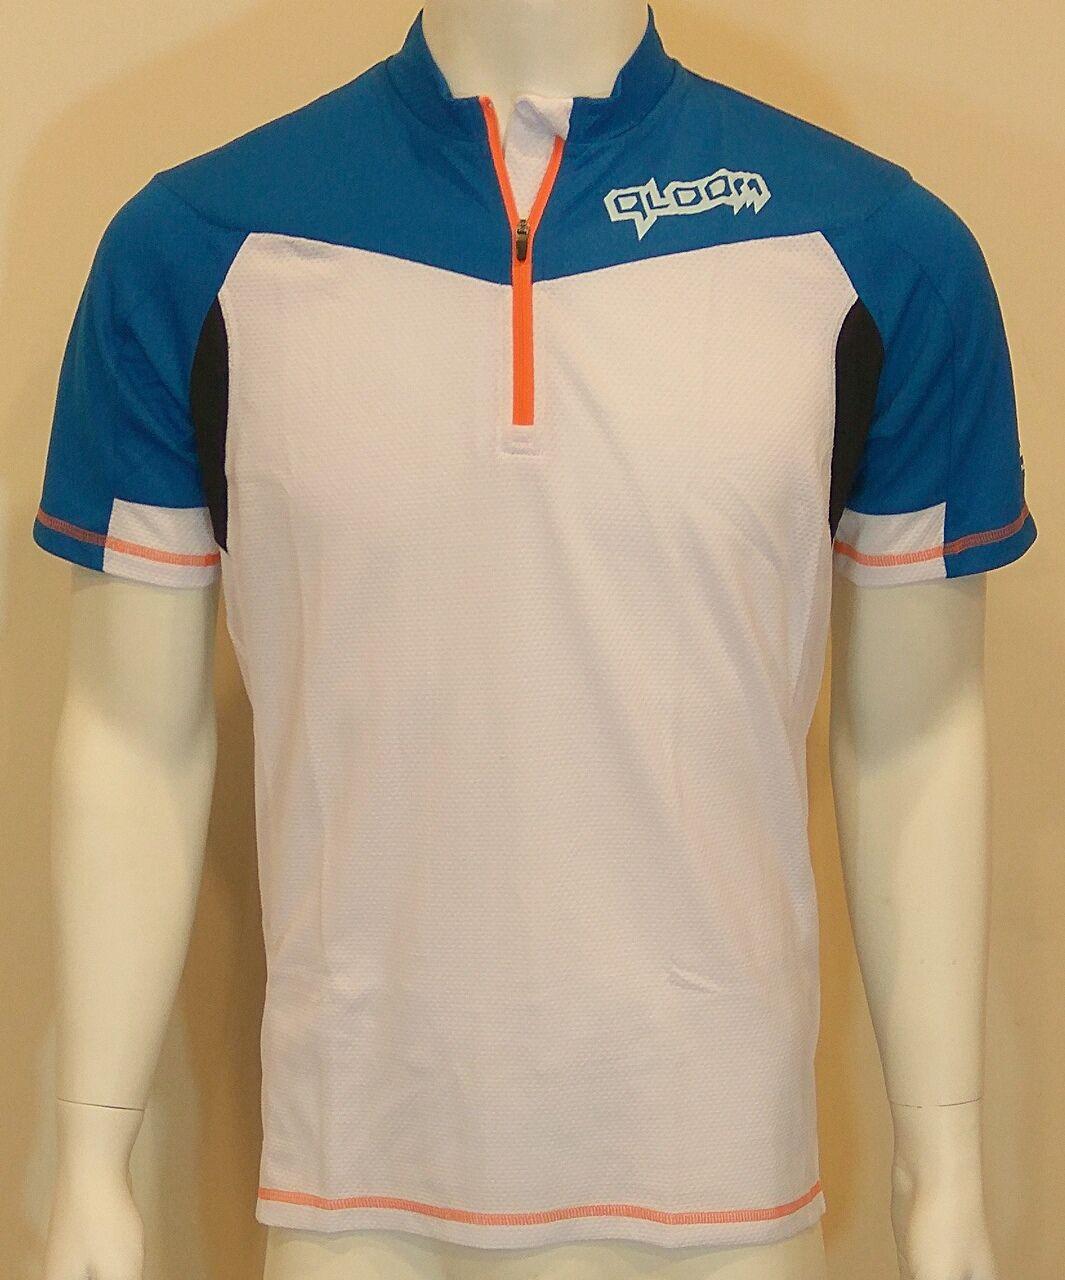 QLOOM NINGALOO short sleeves Training apparel Man White Cycling